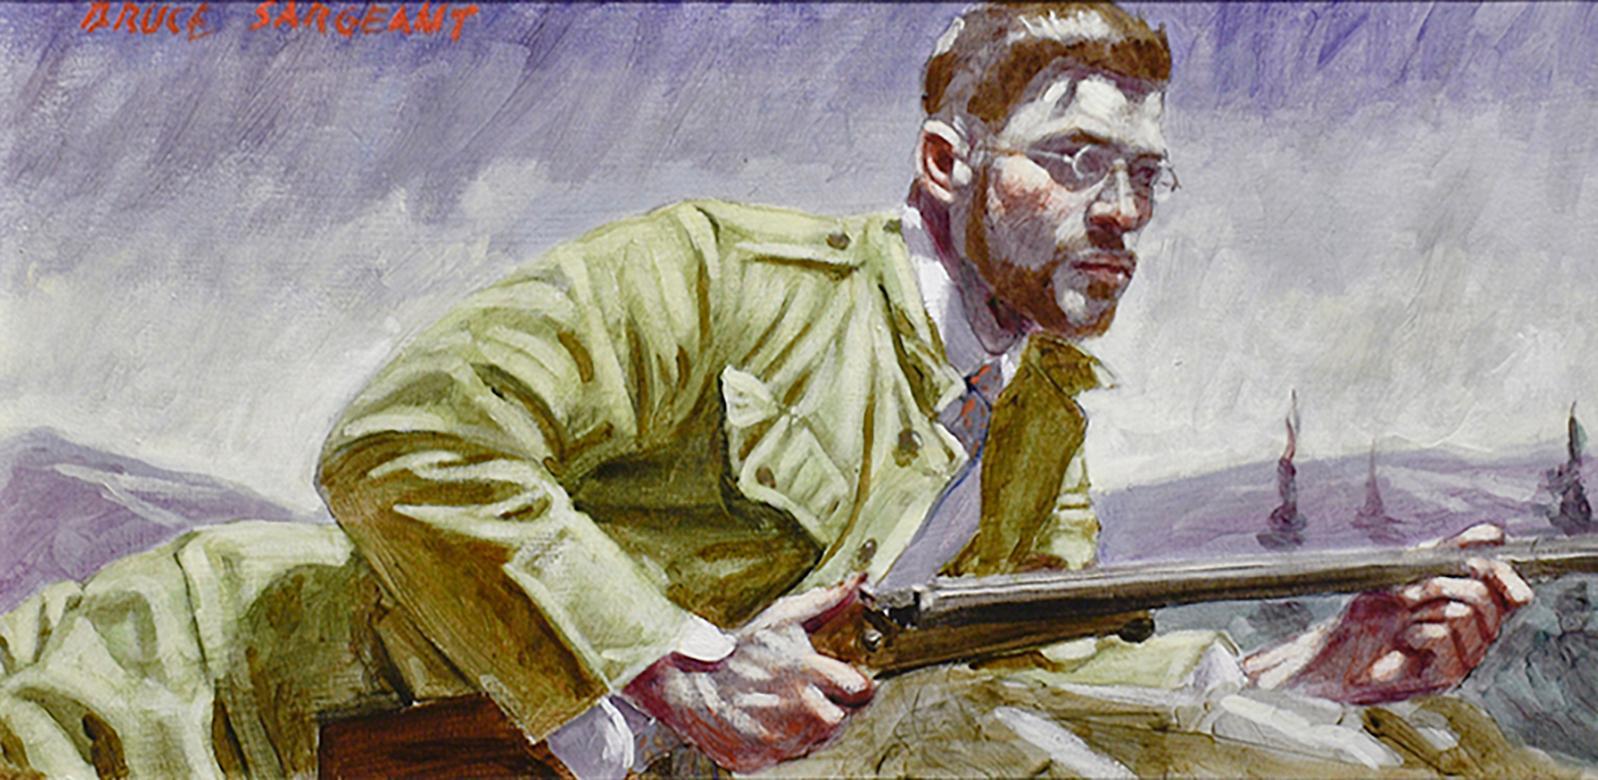 Waiting to Take Aim (Academic Figurative Painting of Hunter by Mark Beard)